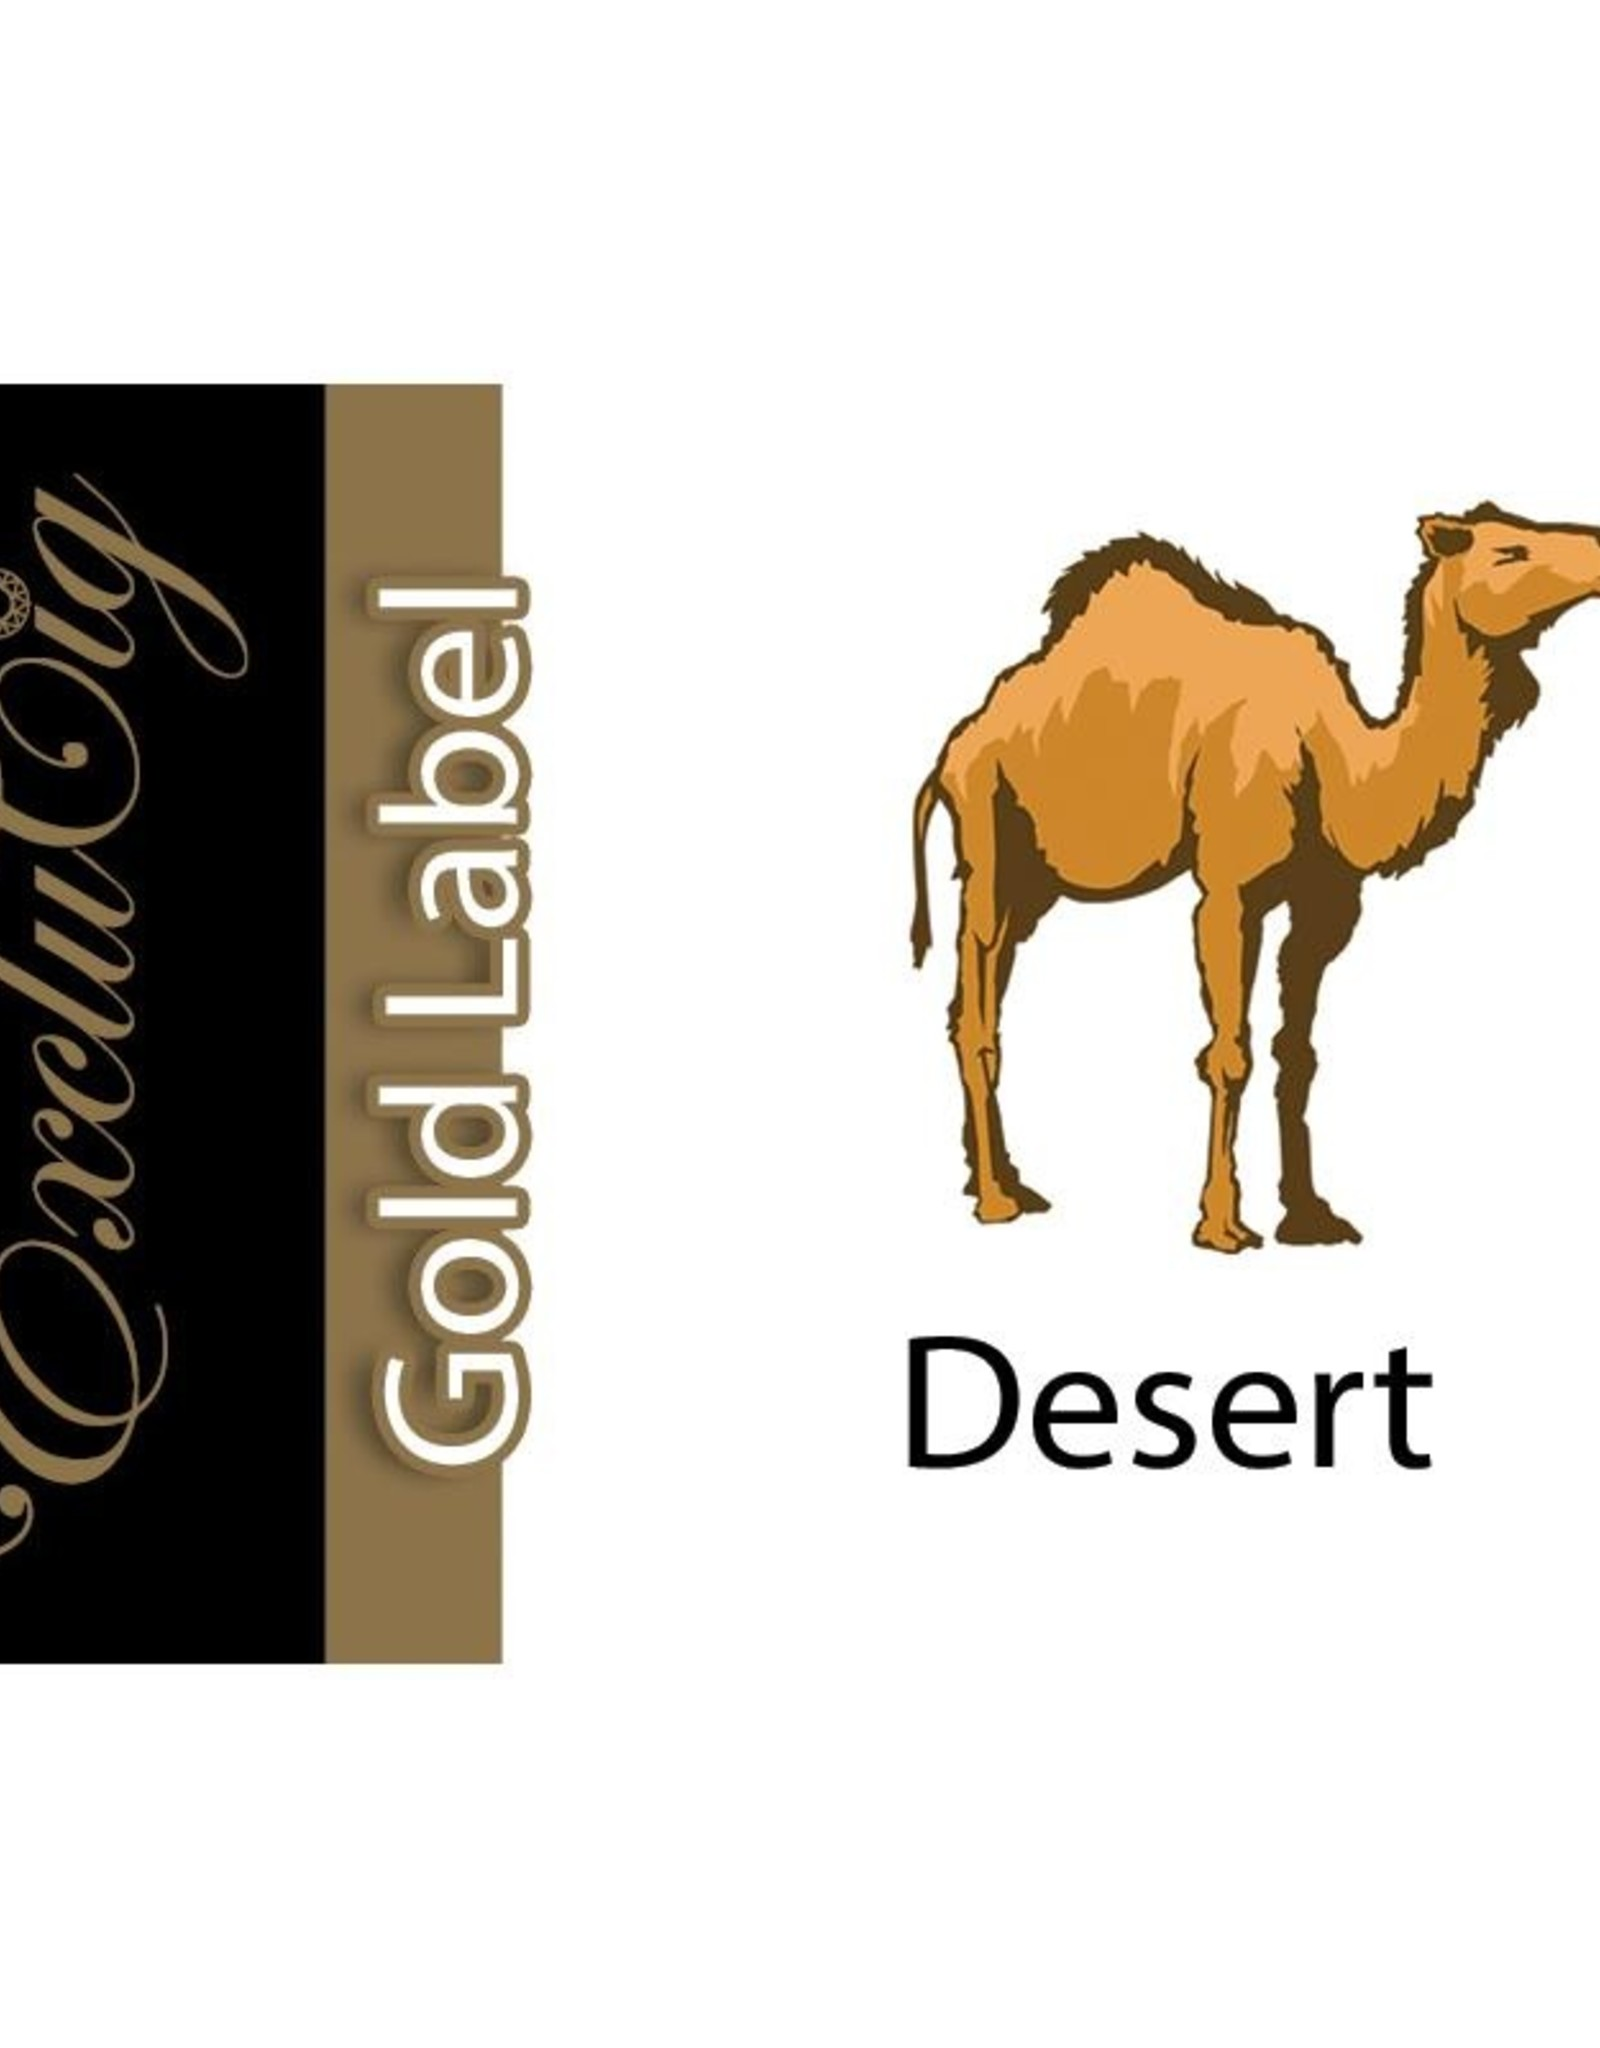 Exclucig Exclucig Gold Label E-liquid Desert 18 mg Nicotine